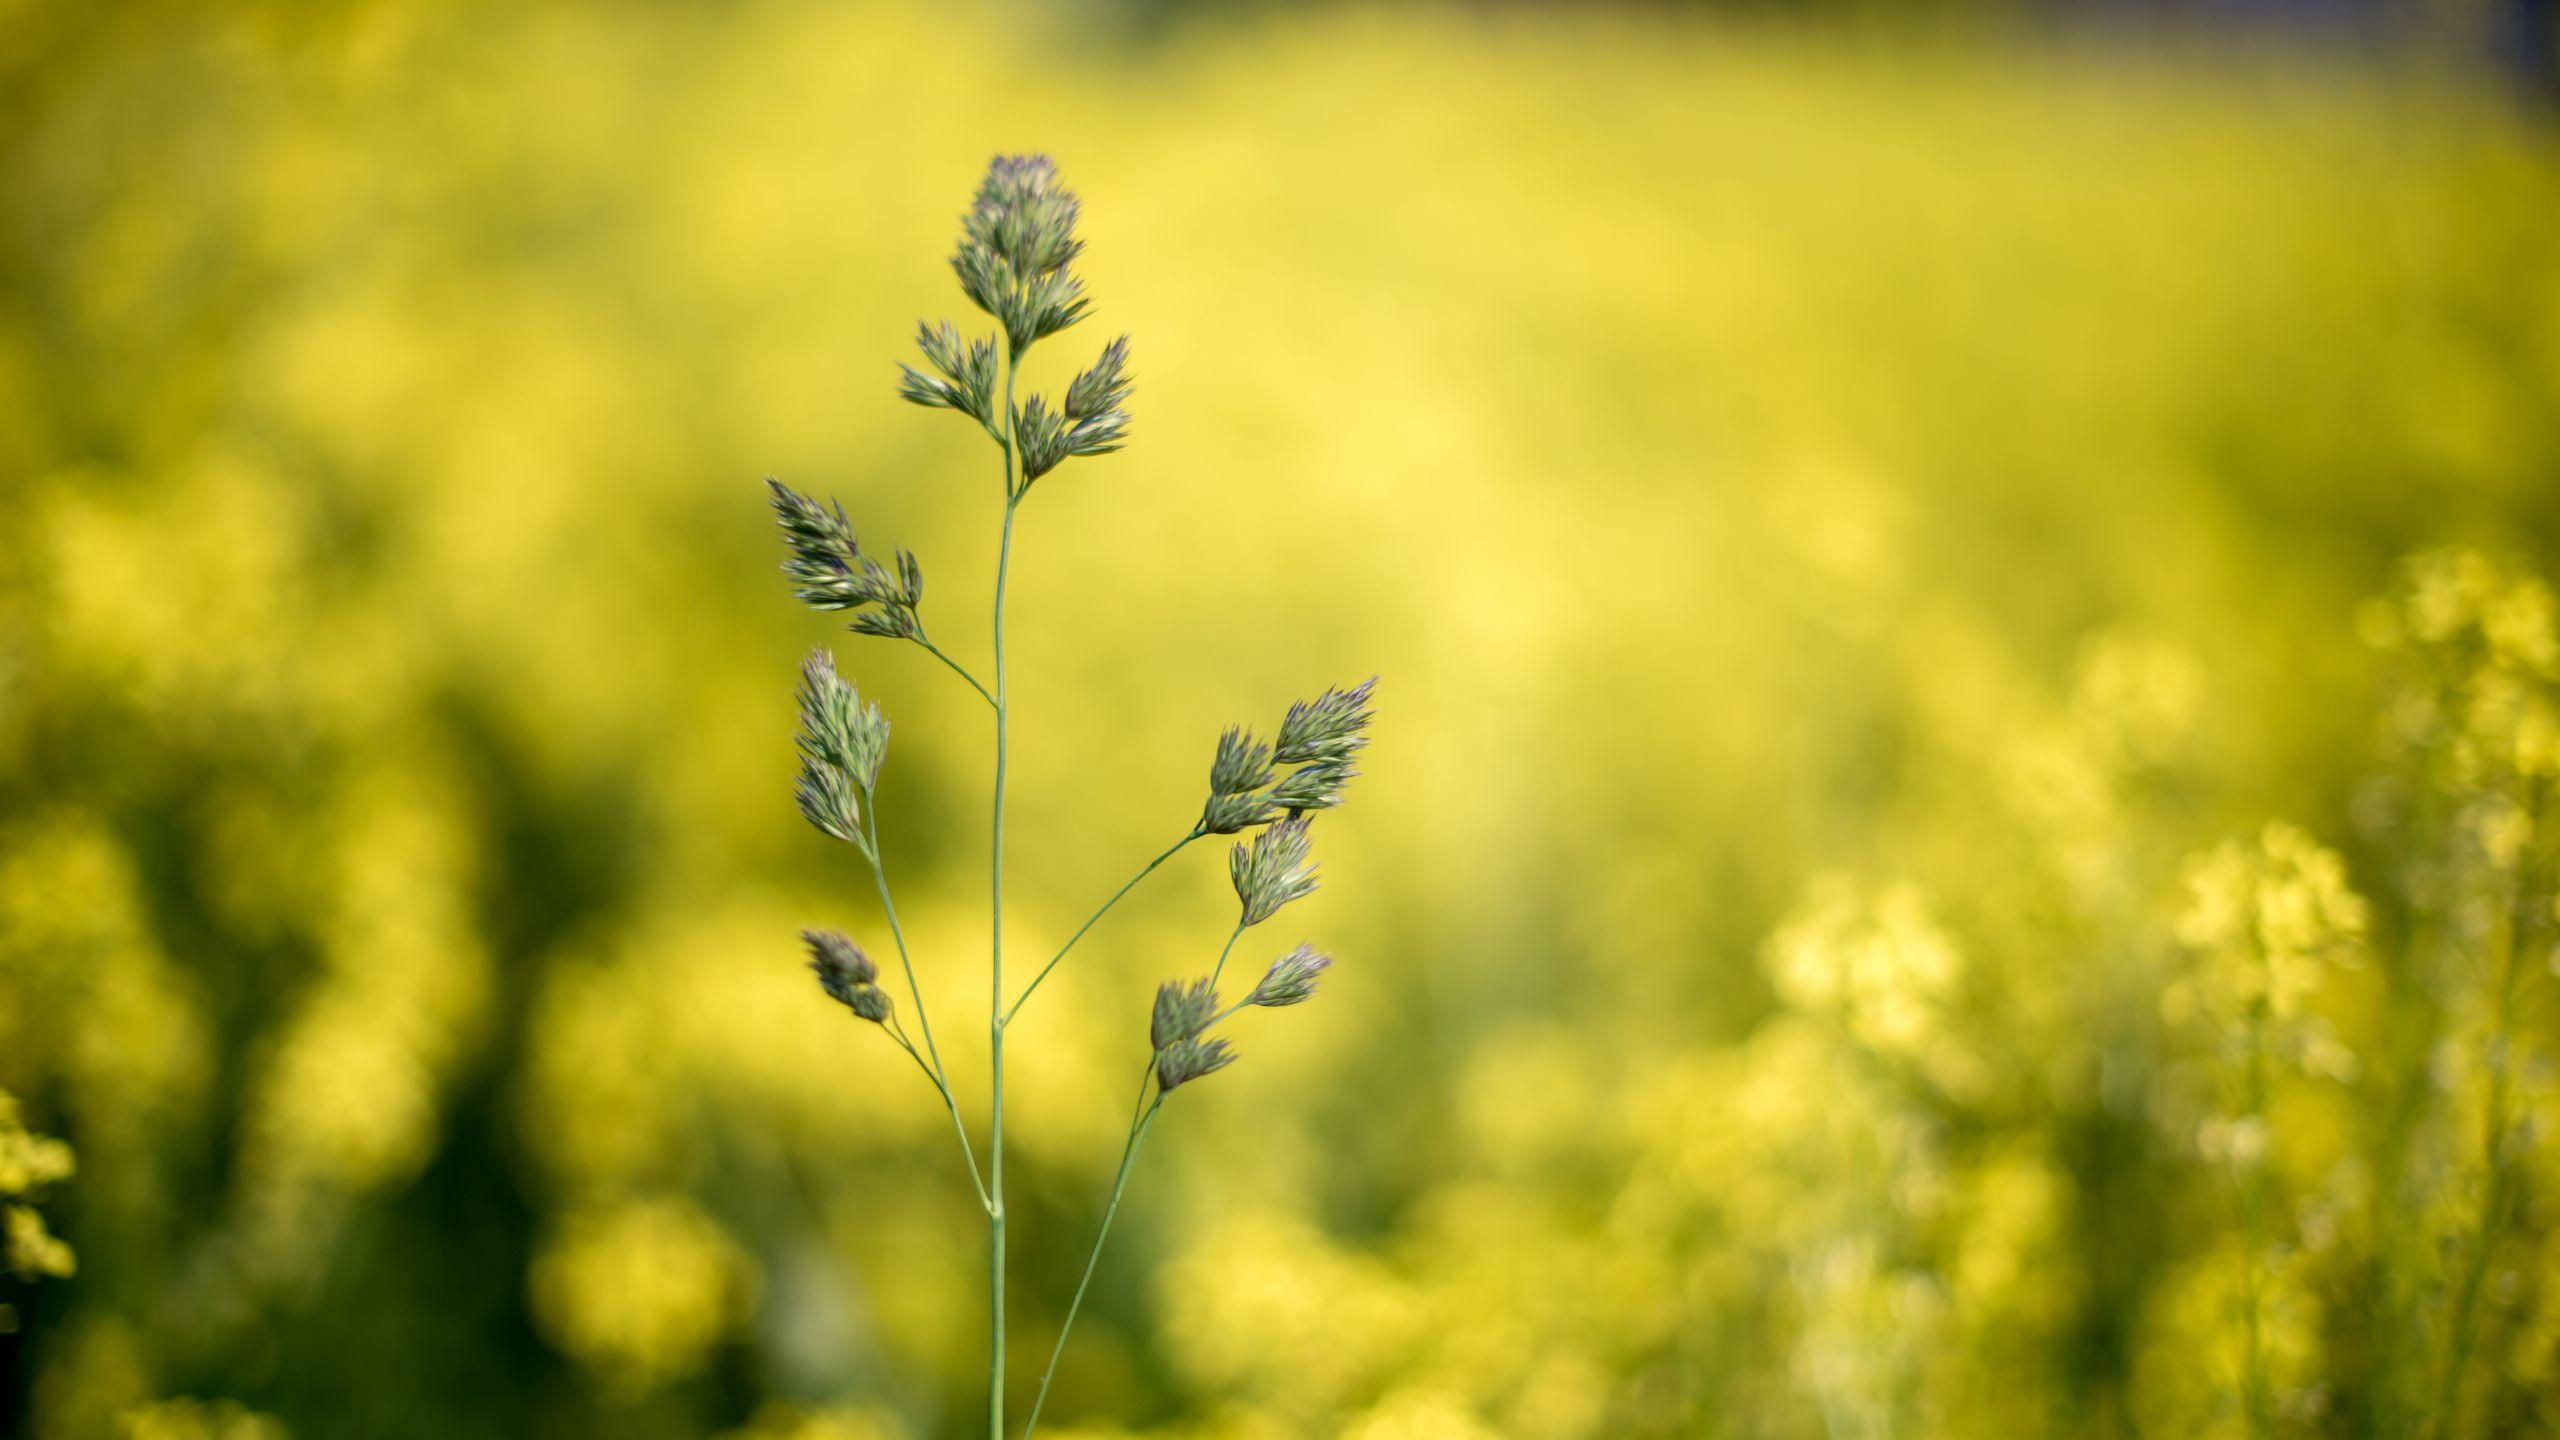 2560x1440 Wallpaper grass, plant, macro, inflorescence, closeup